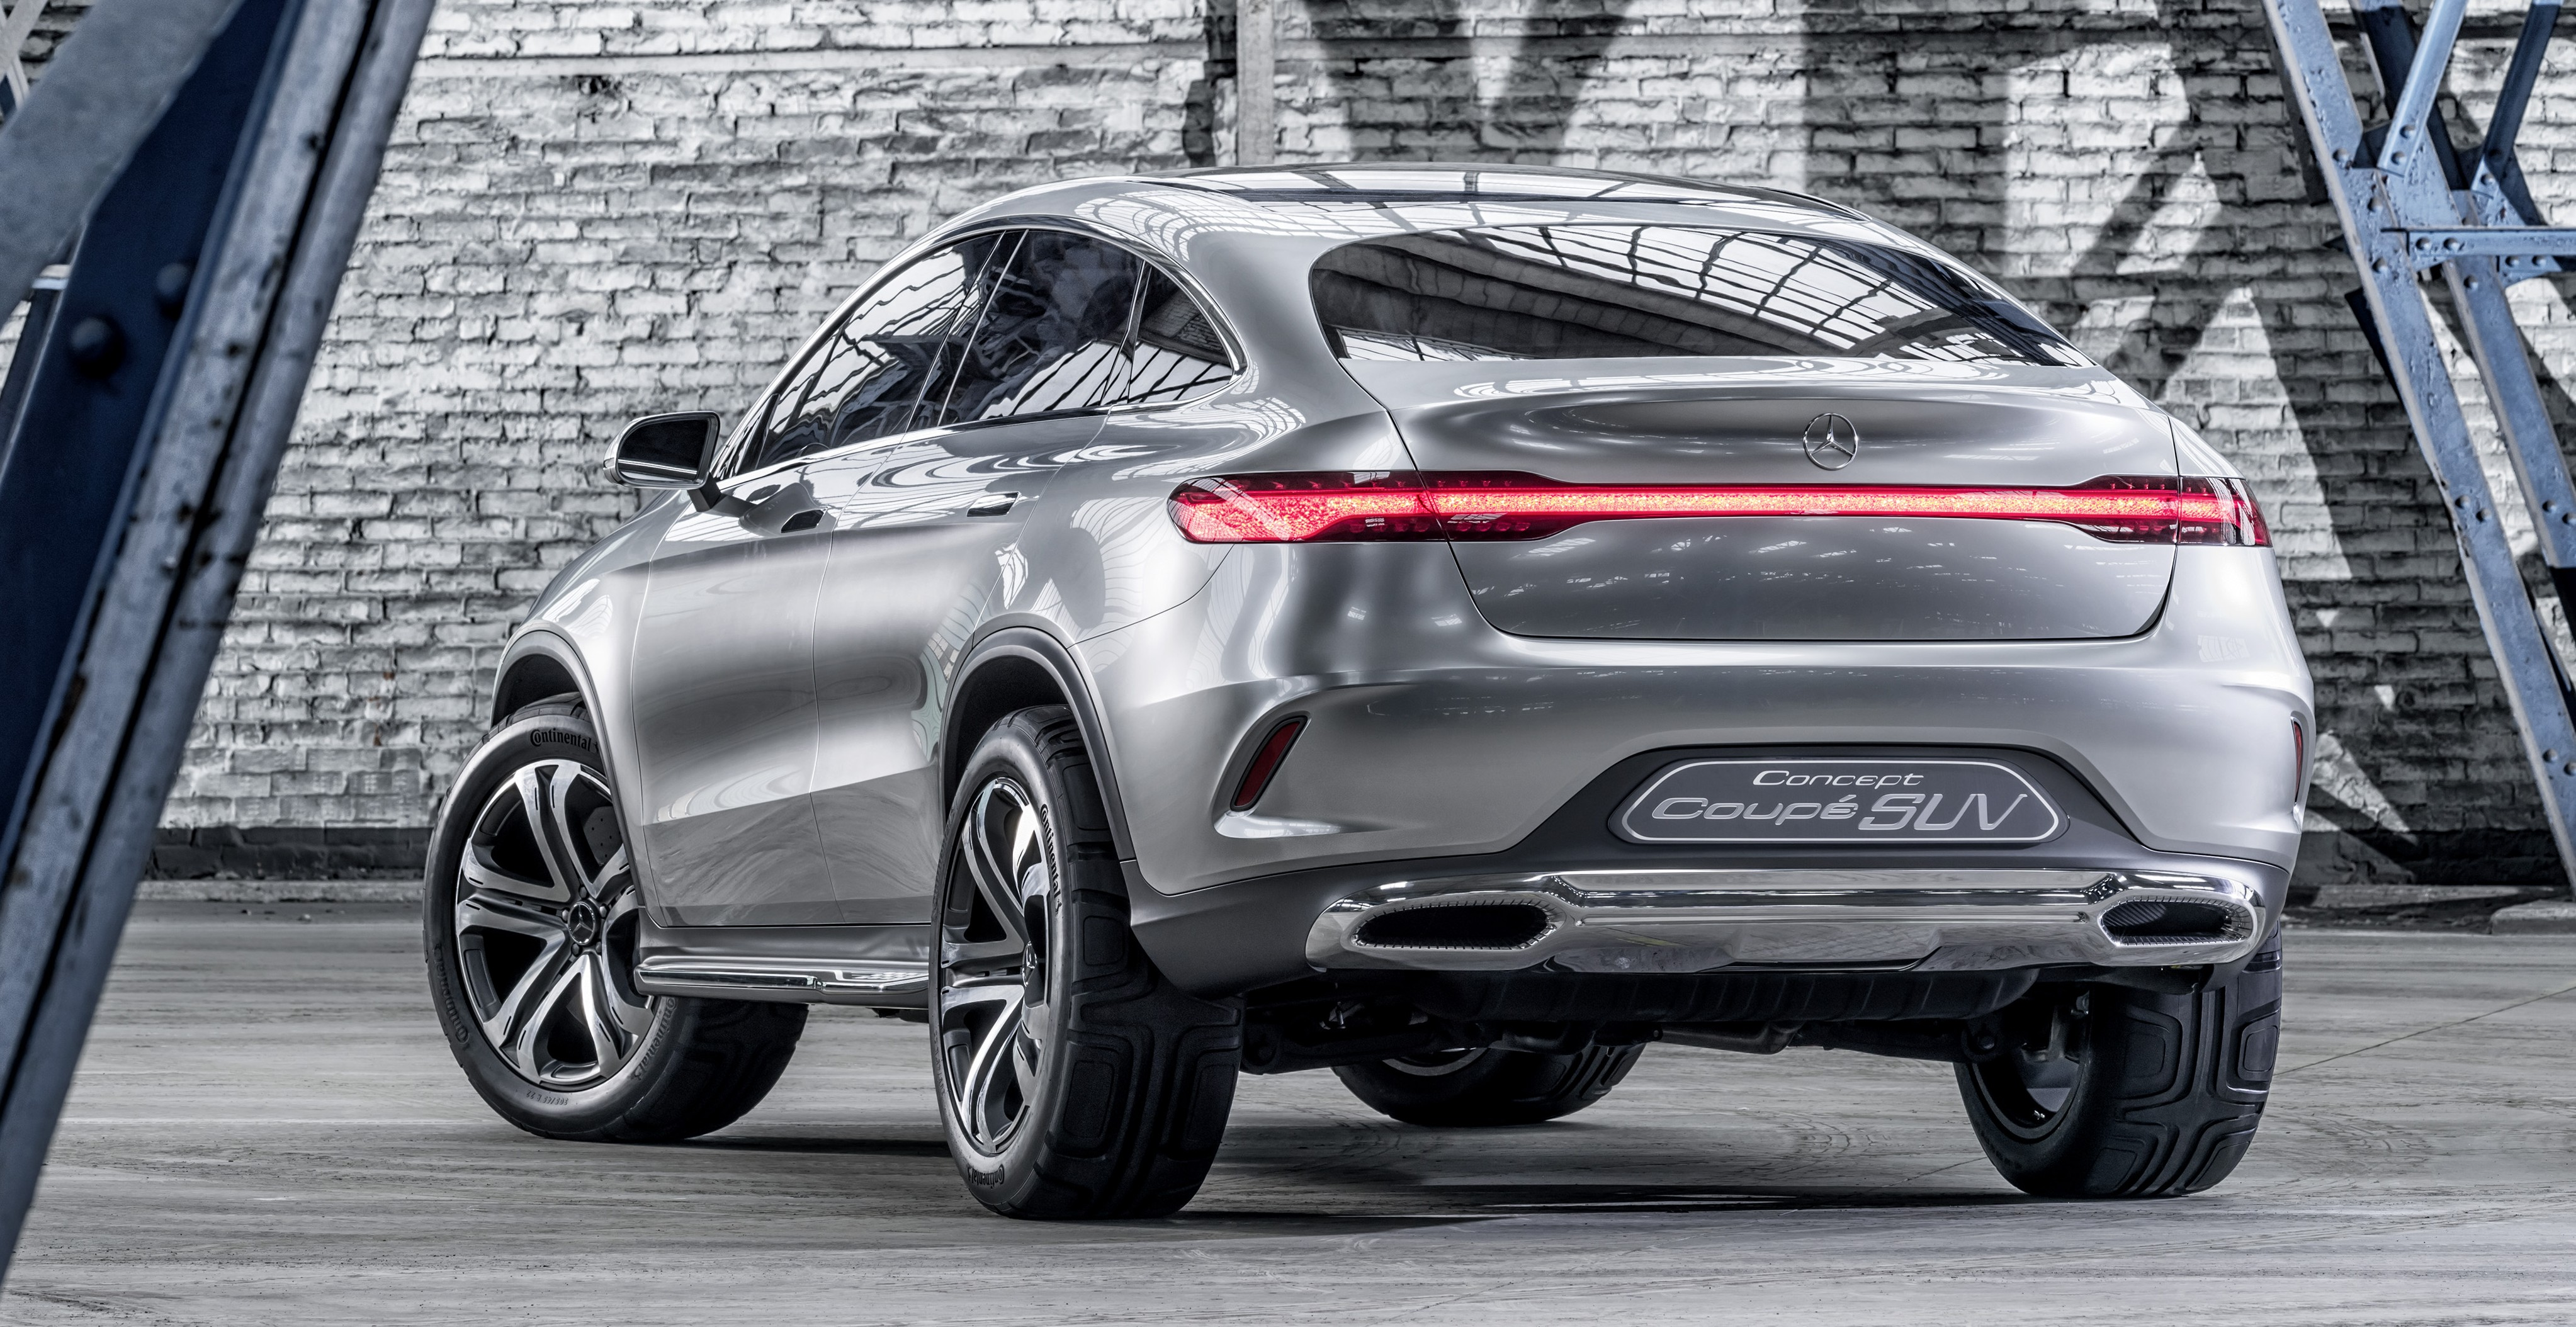 Mercedes S Coupe >> Mercedes-Benz Coupe SUV Concept previews X6 rival Paul Tan - Image 242561